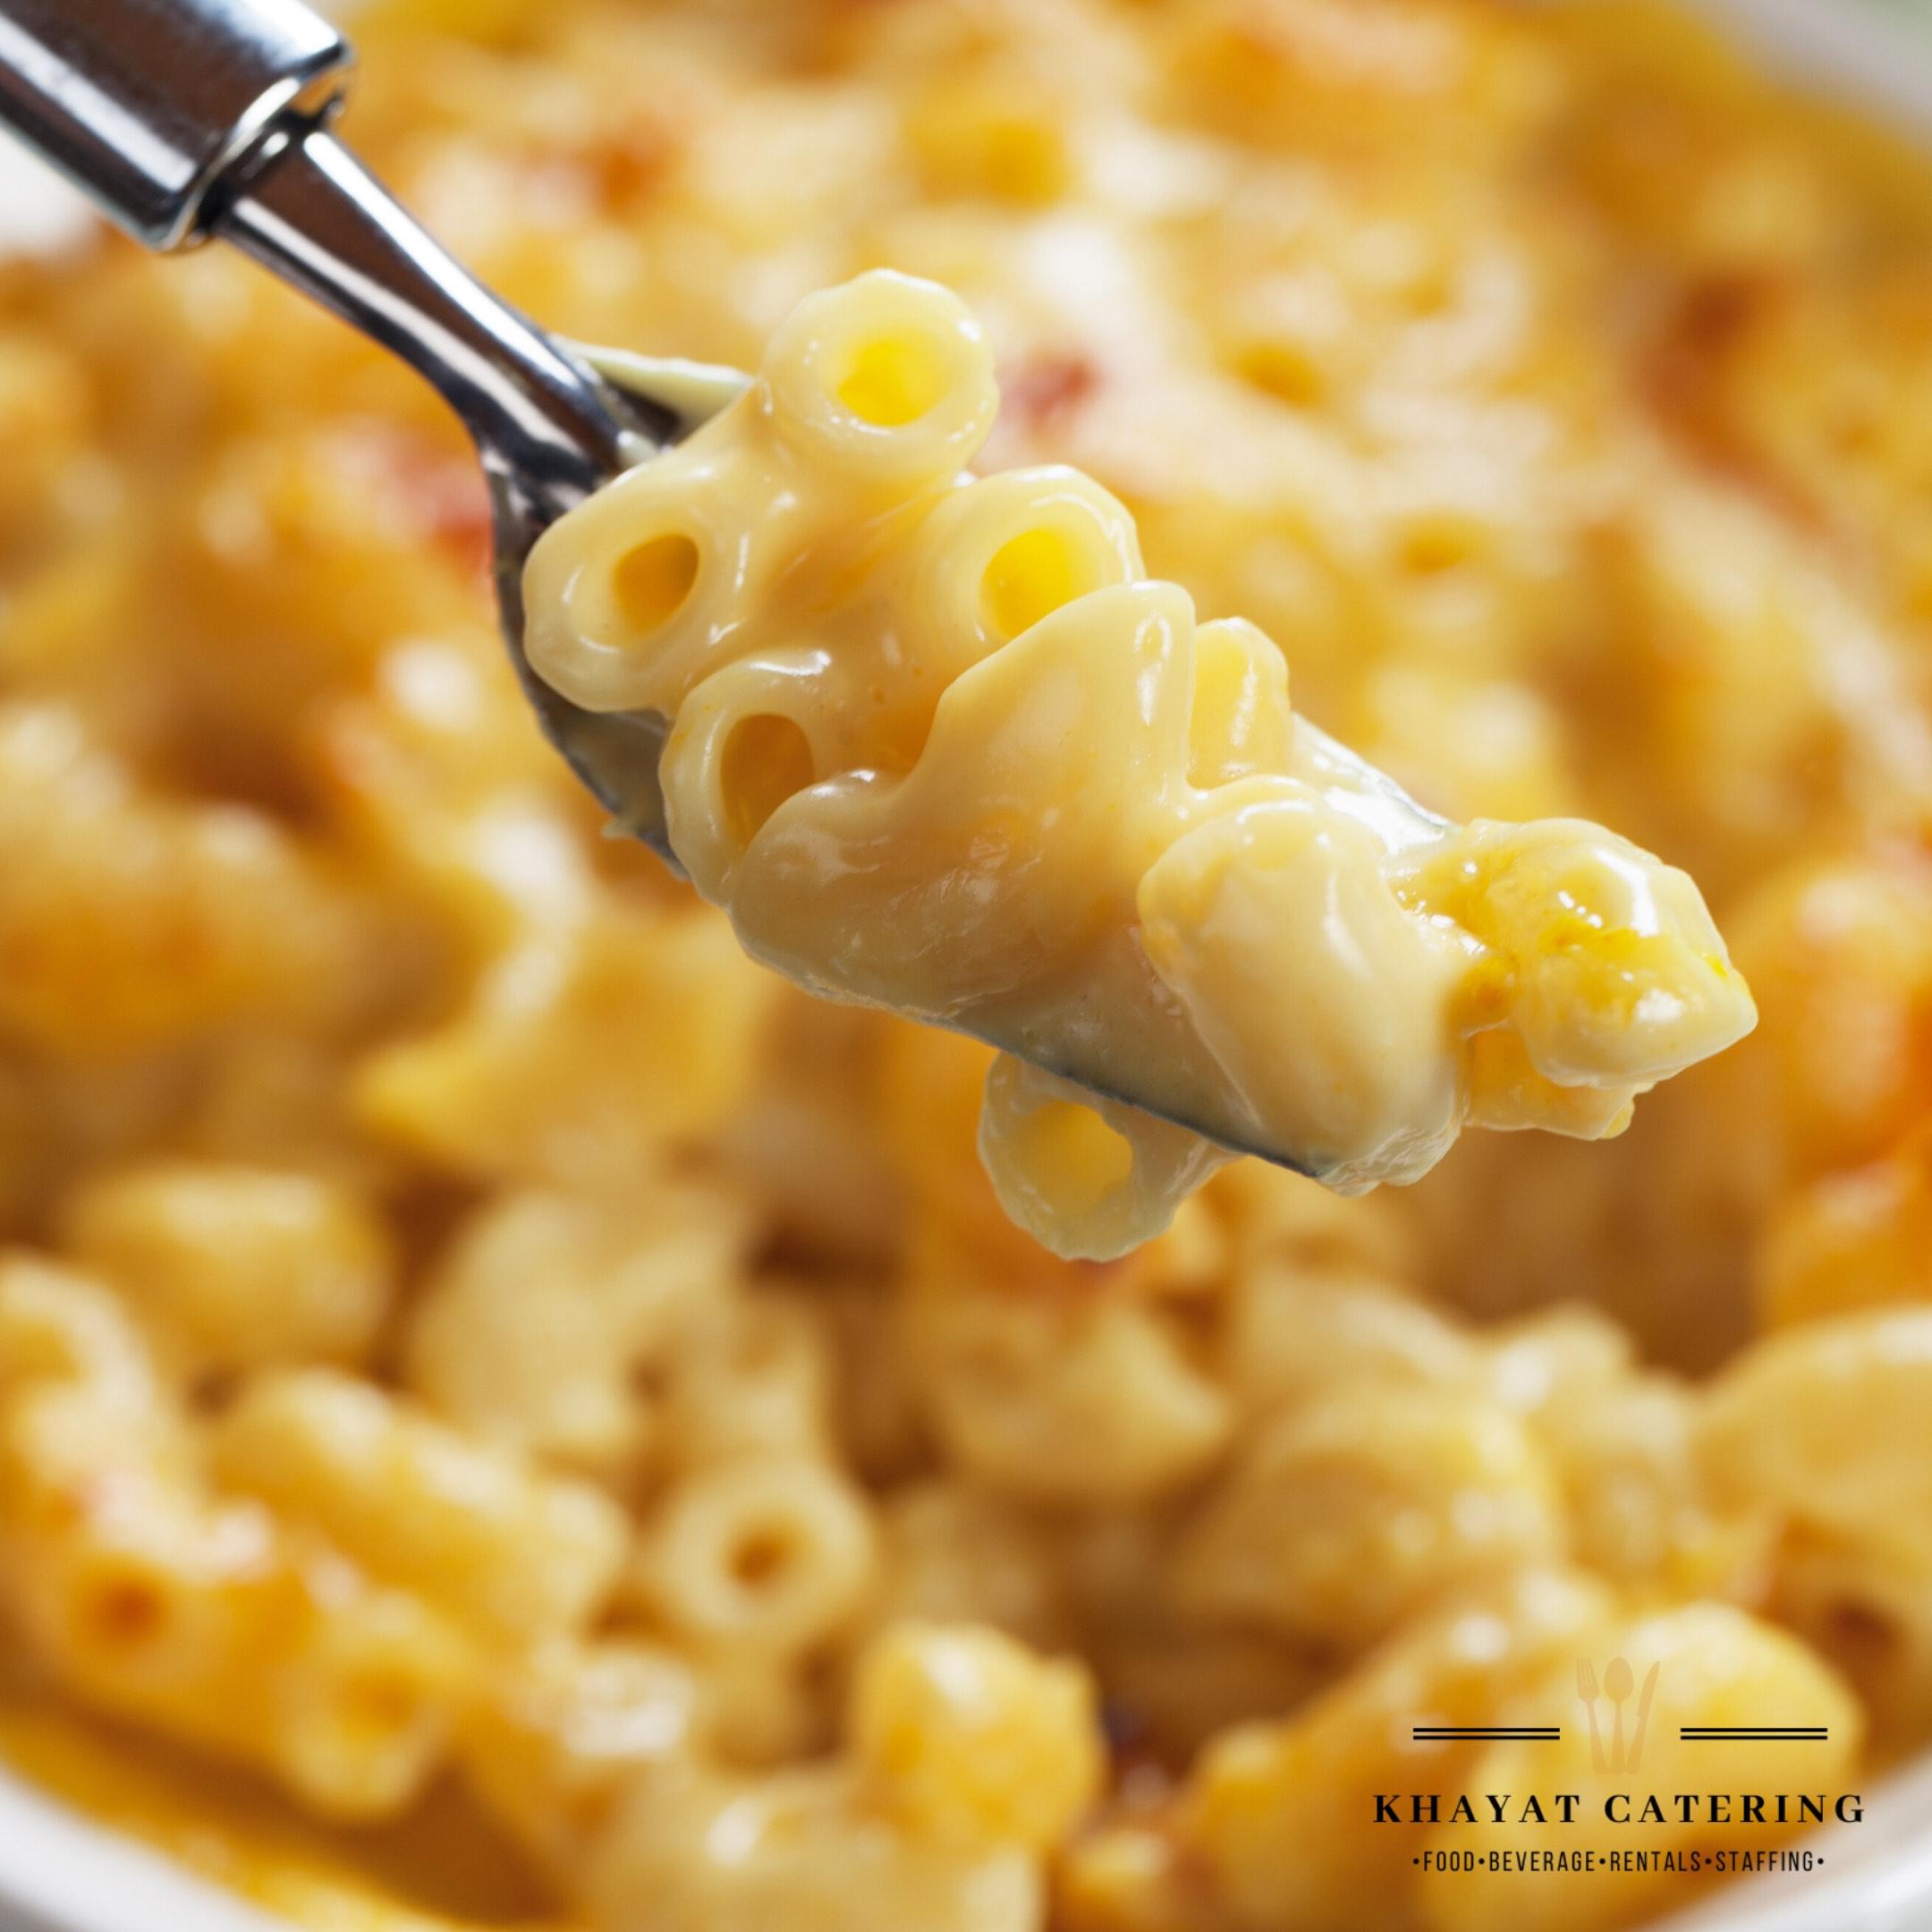 Khayat Catering Mac n cheese